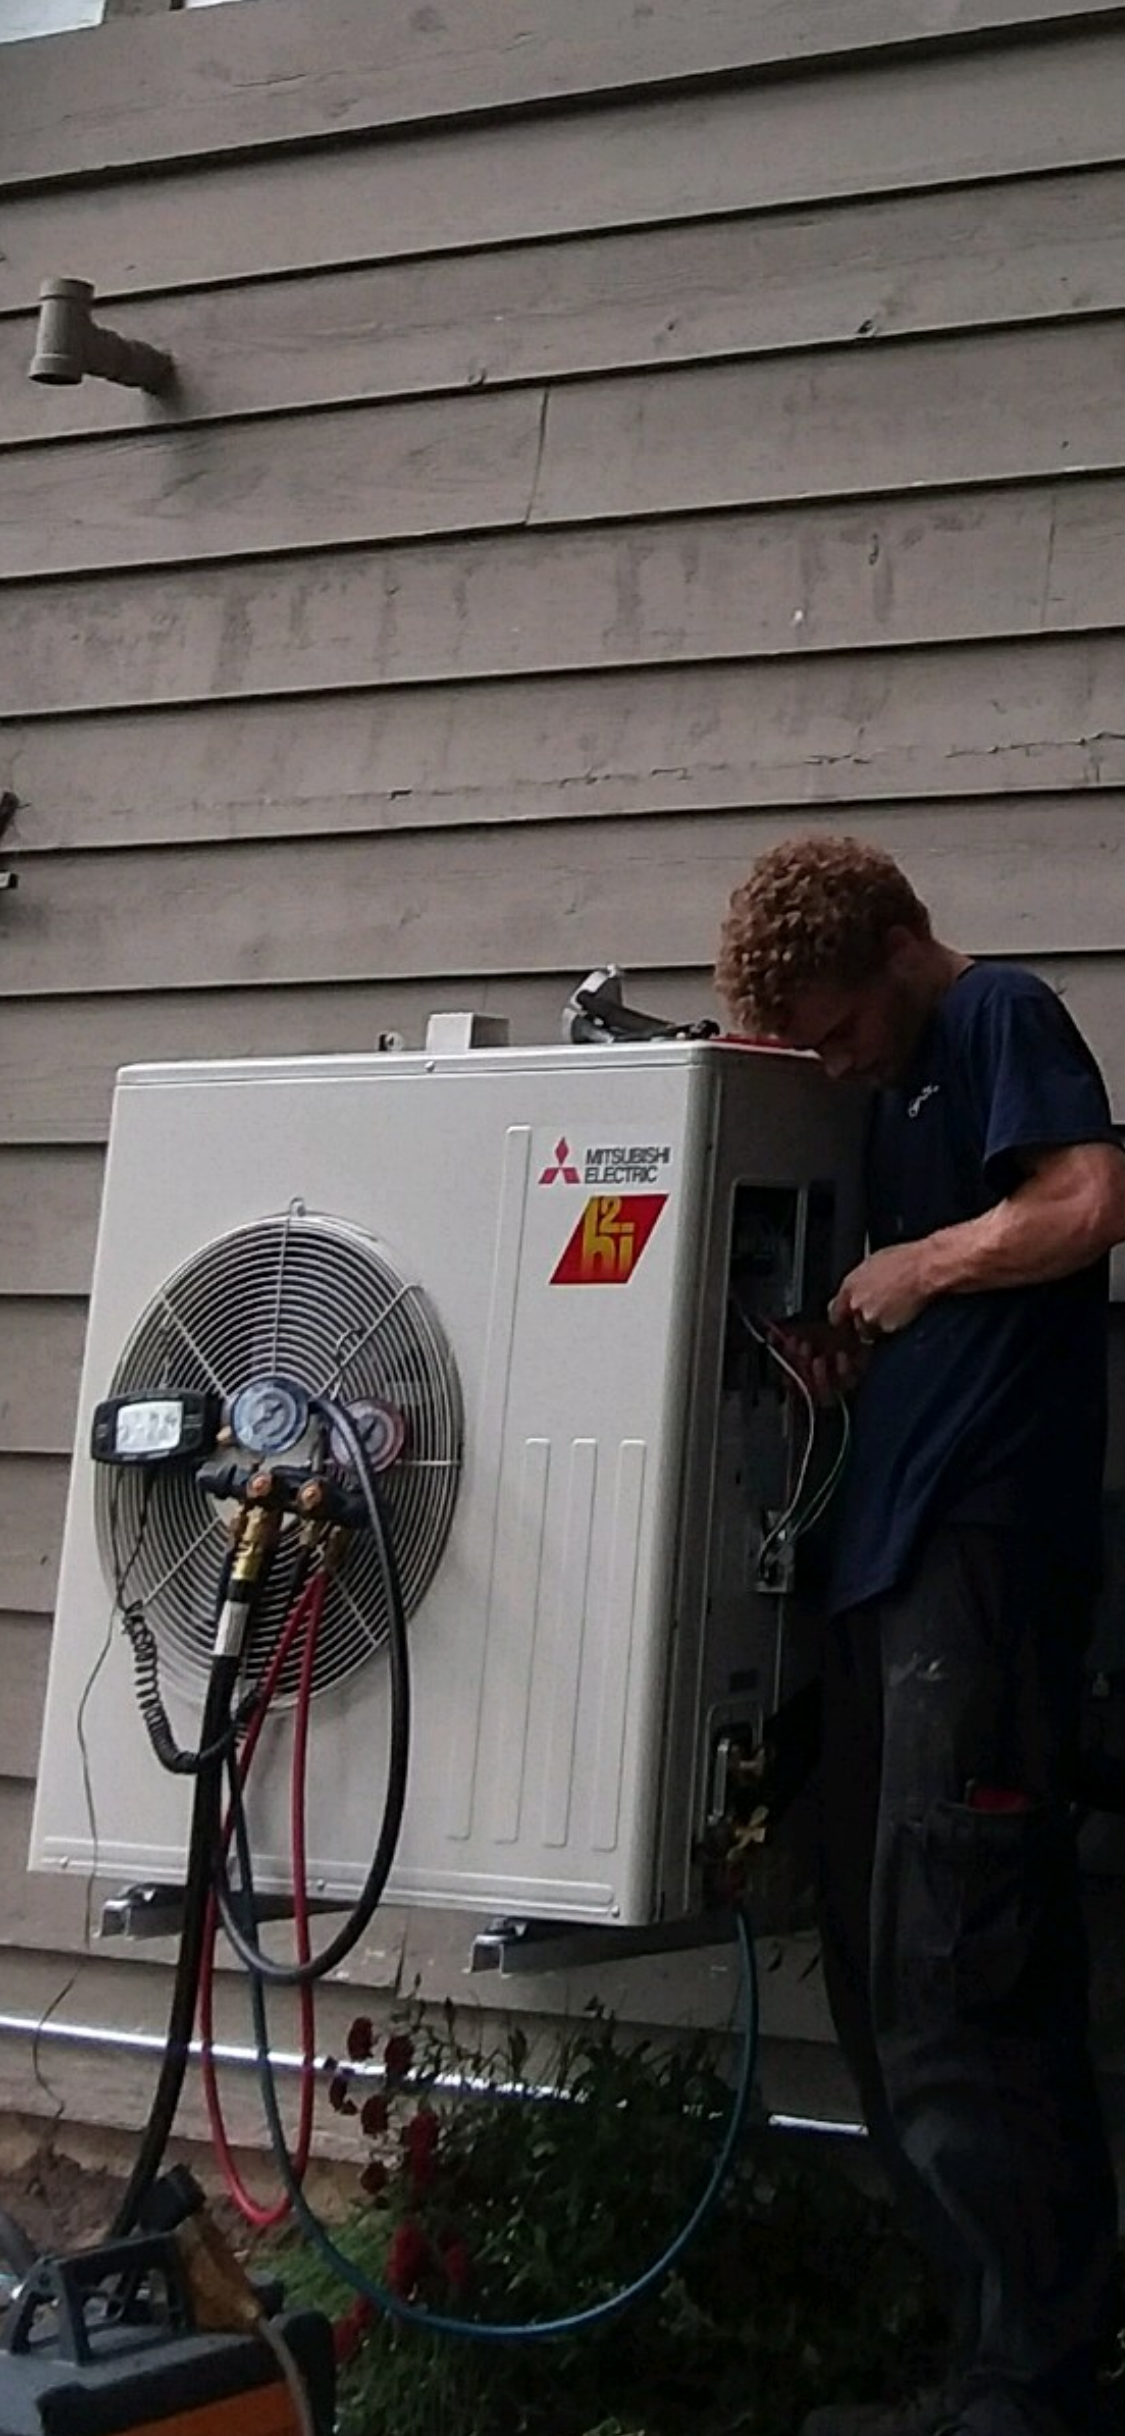 Compass Installation Technician, Kyle, installing a